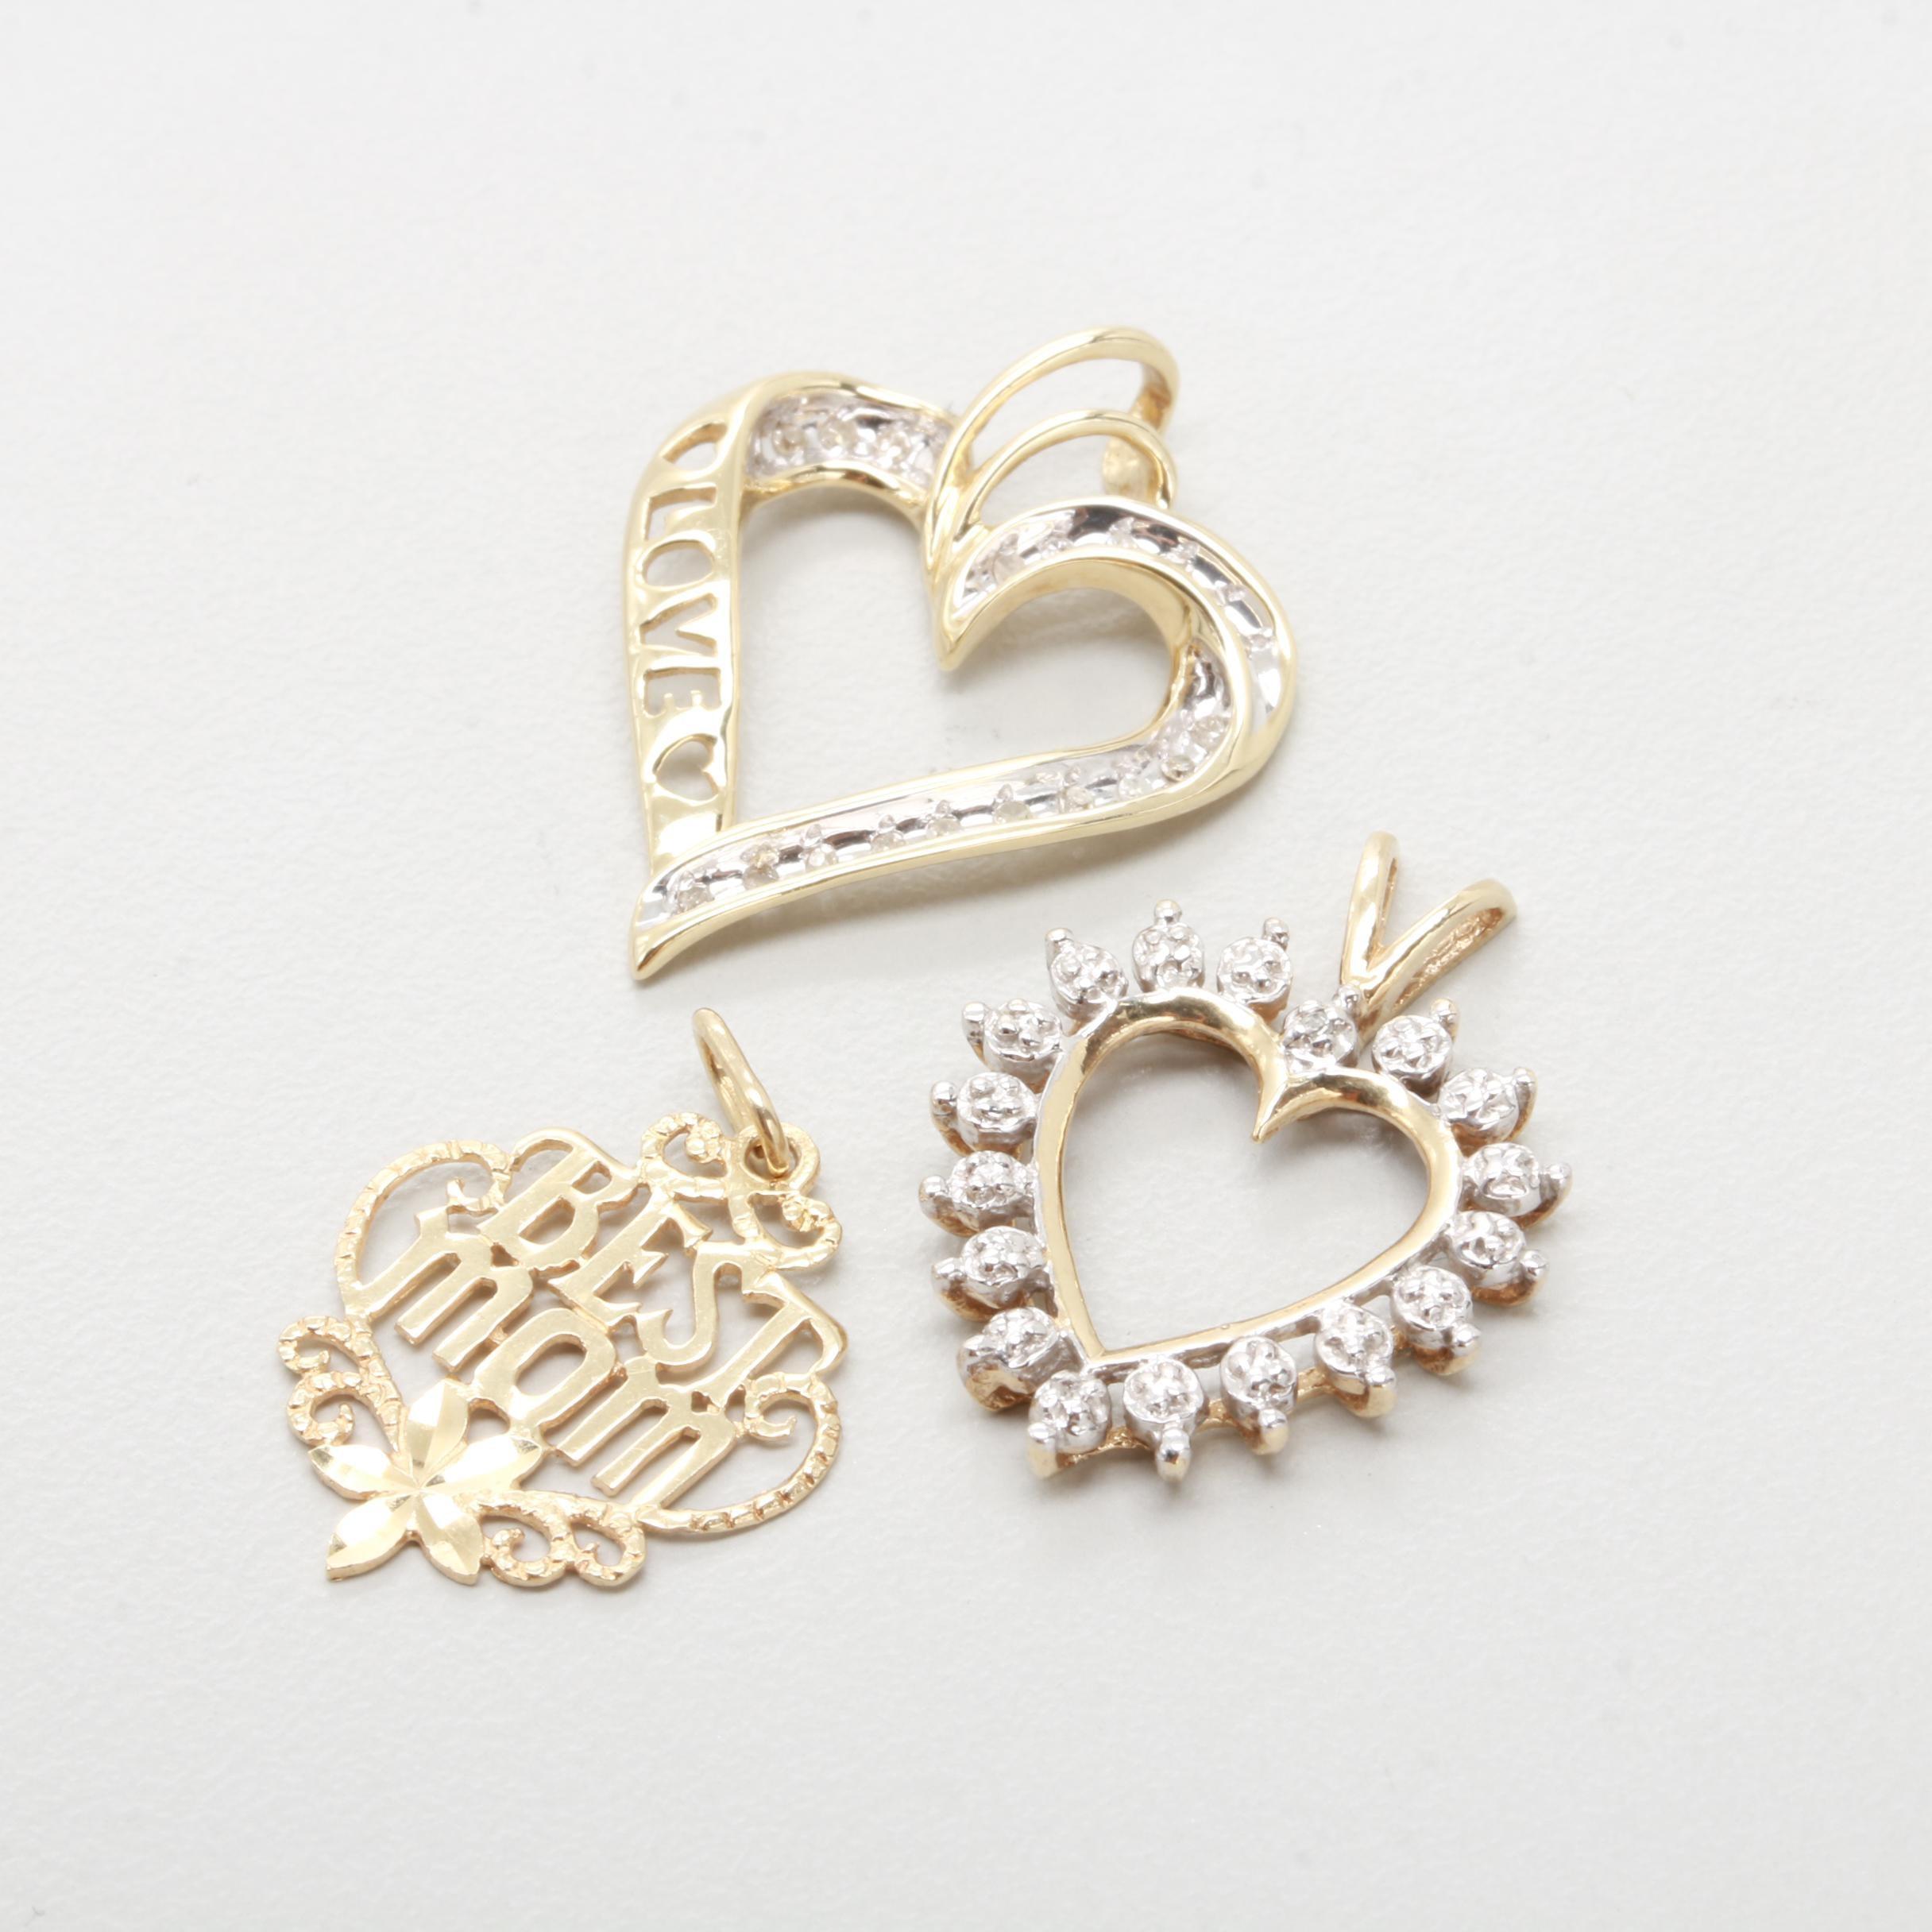 10K & 14K Yellow Gold Diamond Pendant